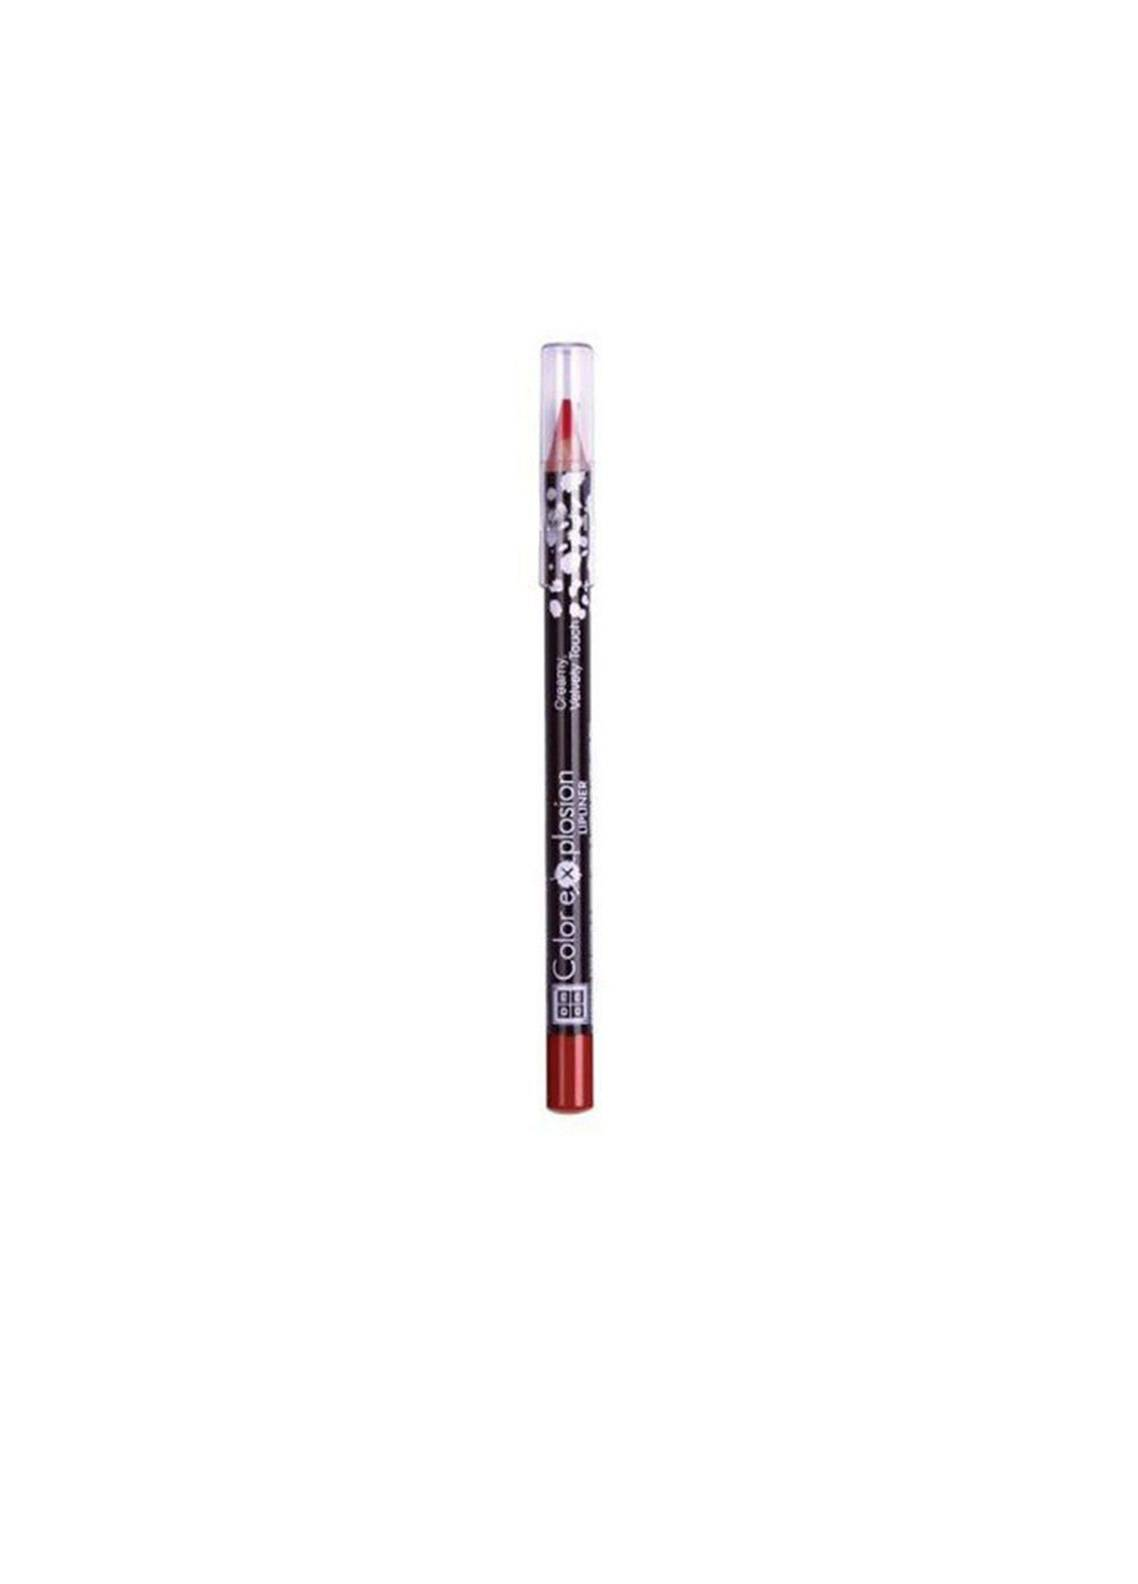 DMGM Color Explosion Lipliner - Crimson Envy - 08